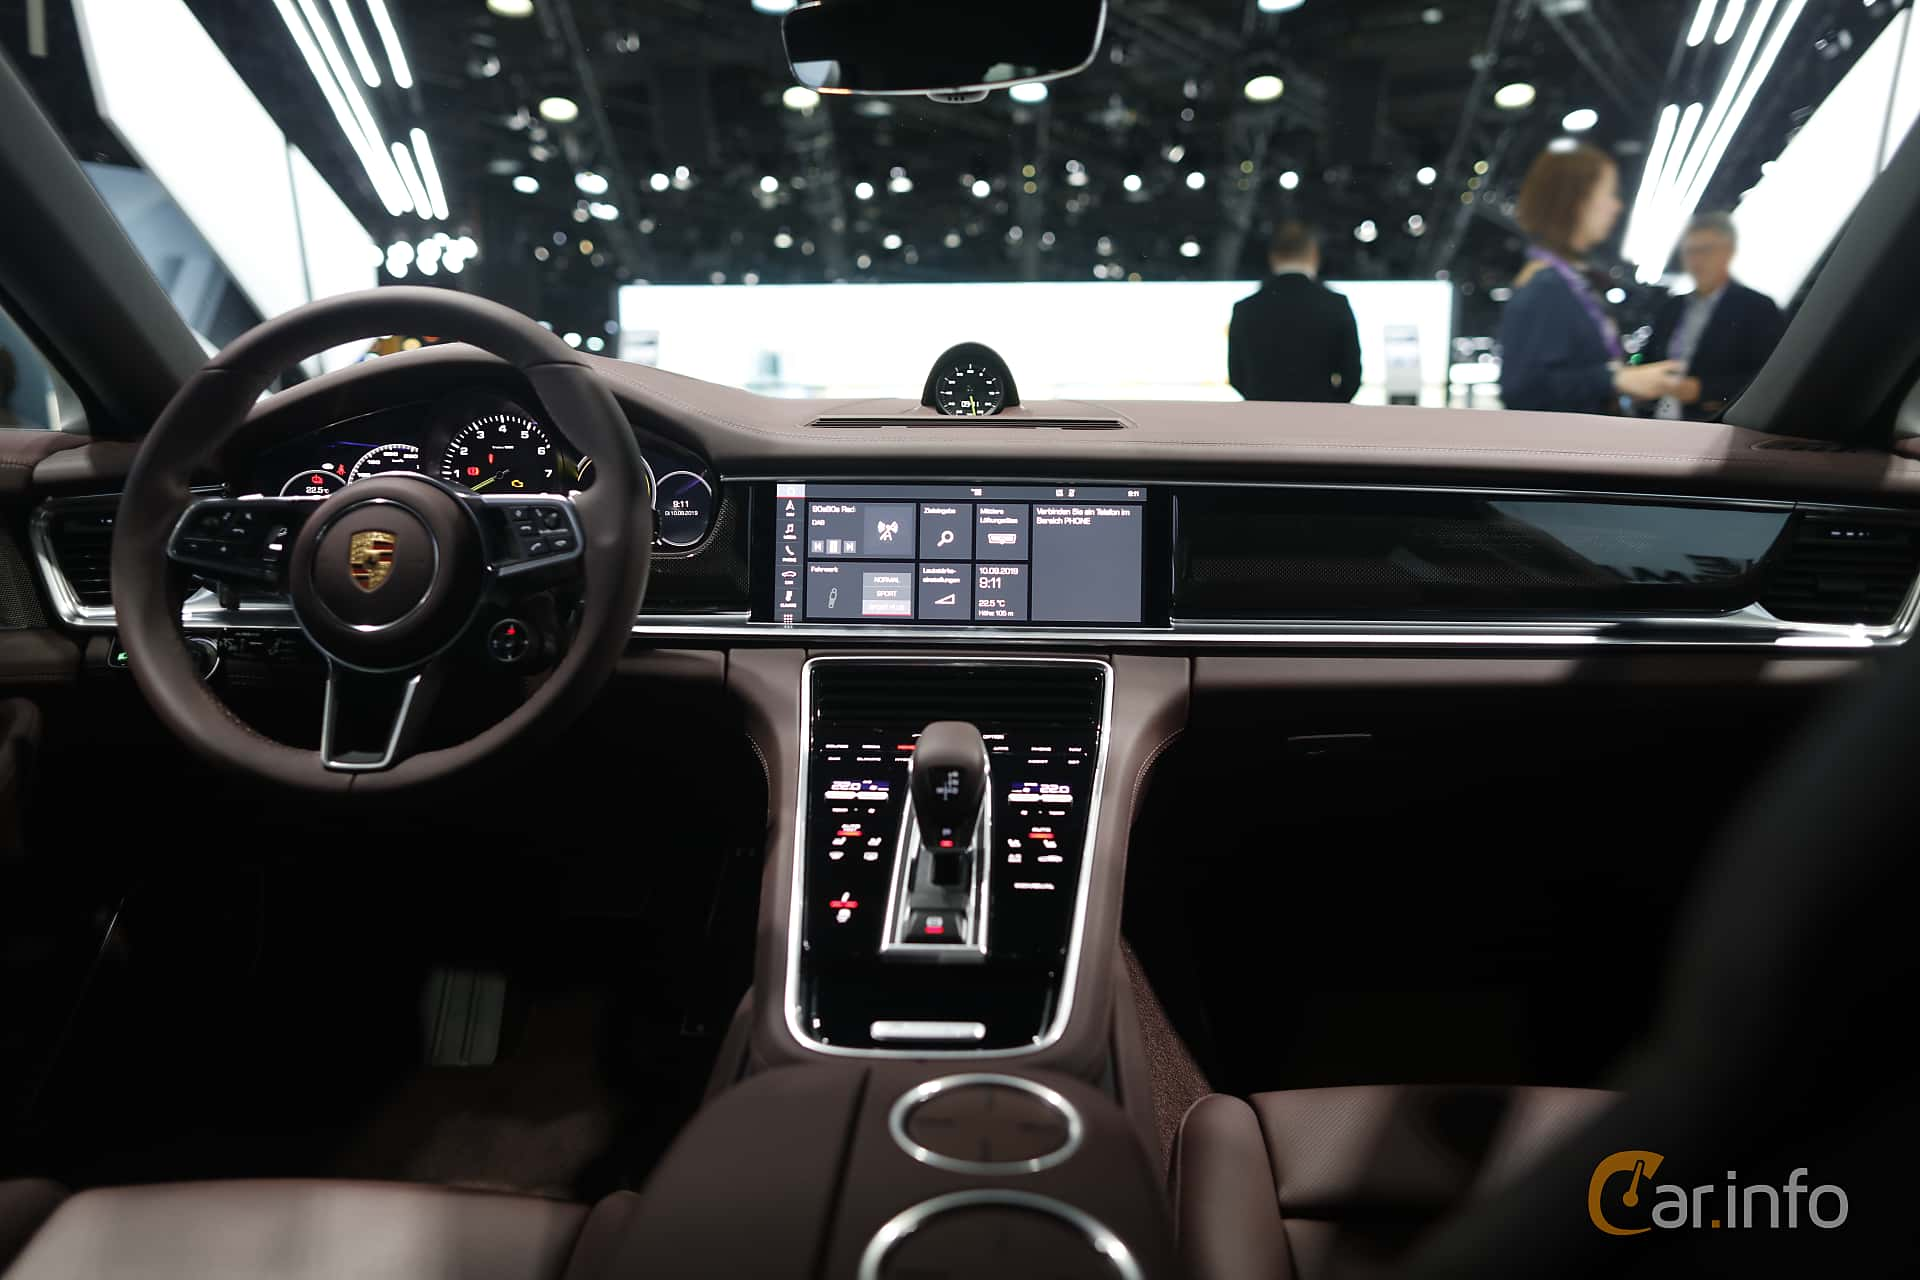 Interior of Porsche Panamera 4 E-Hybrid 2.9 V6 4 PDK, 462ps, 2020 at IAA 2019